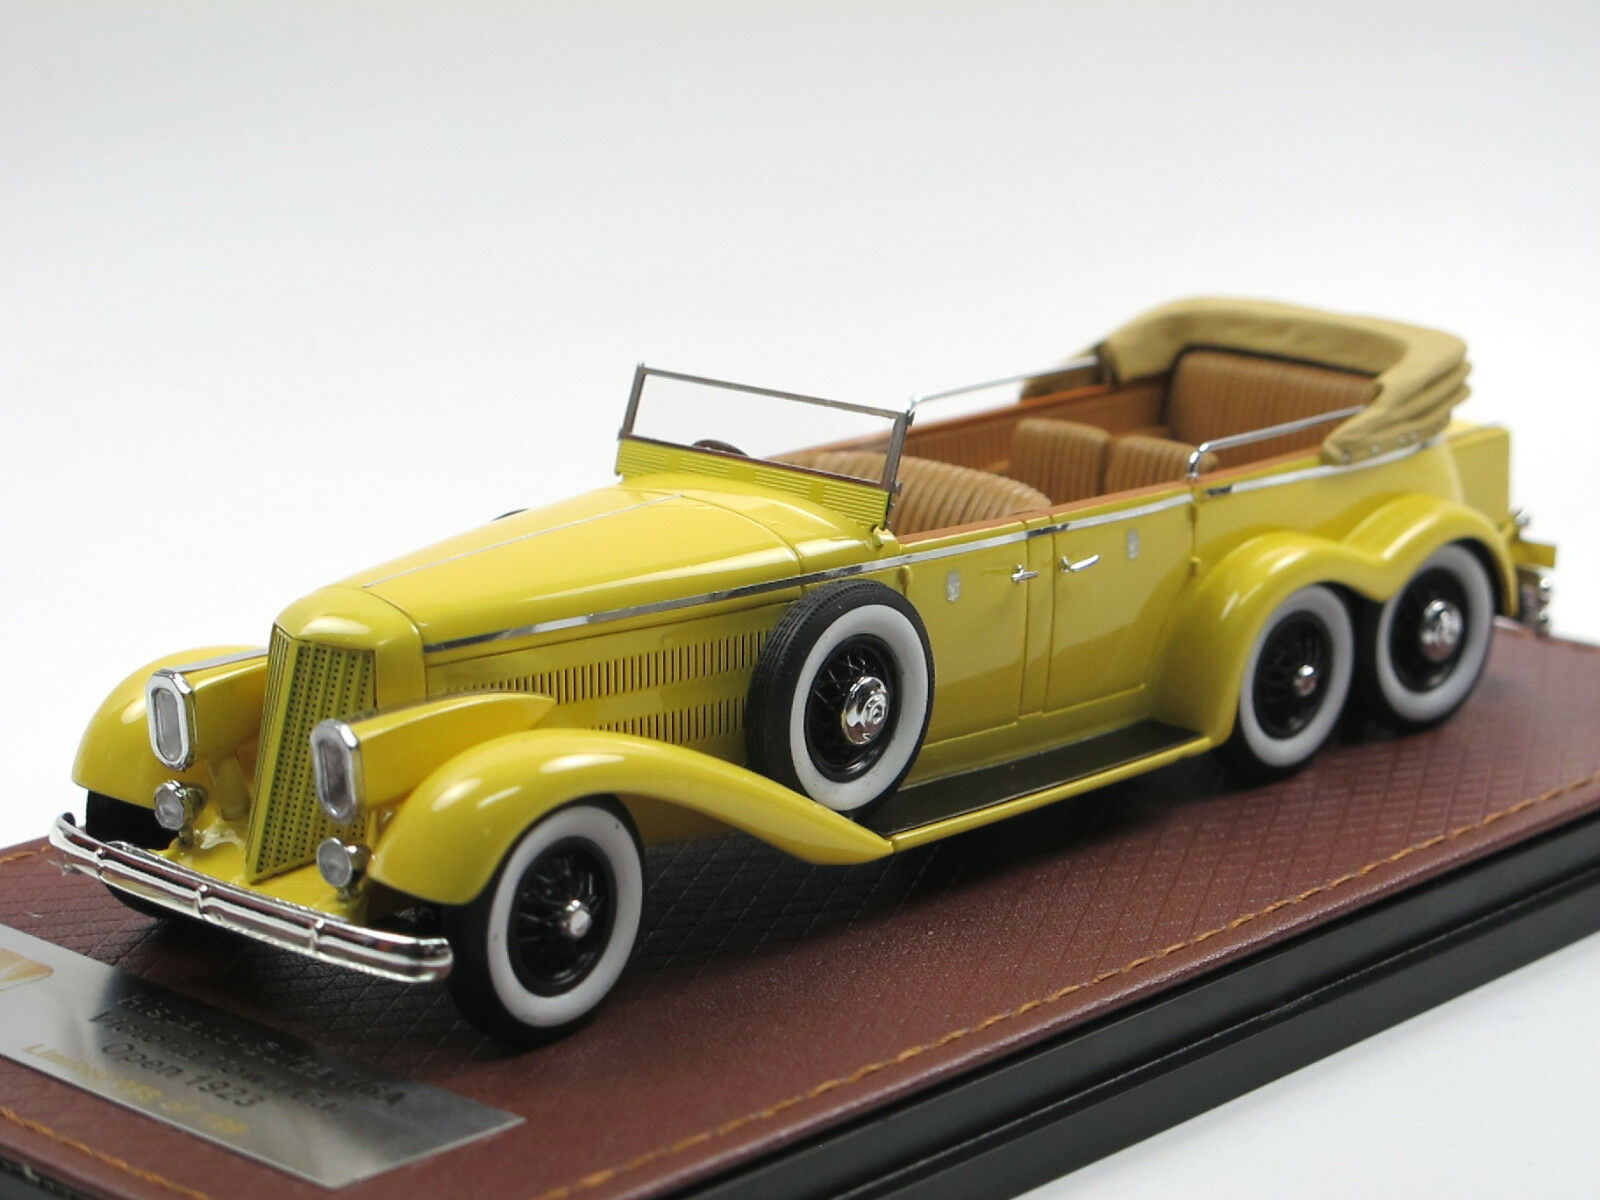 GLM 1923 Hispano-Suiza h6a Victoria 6-Wheels Town Car-Coupe de Ville Open 1/43